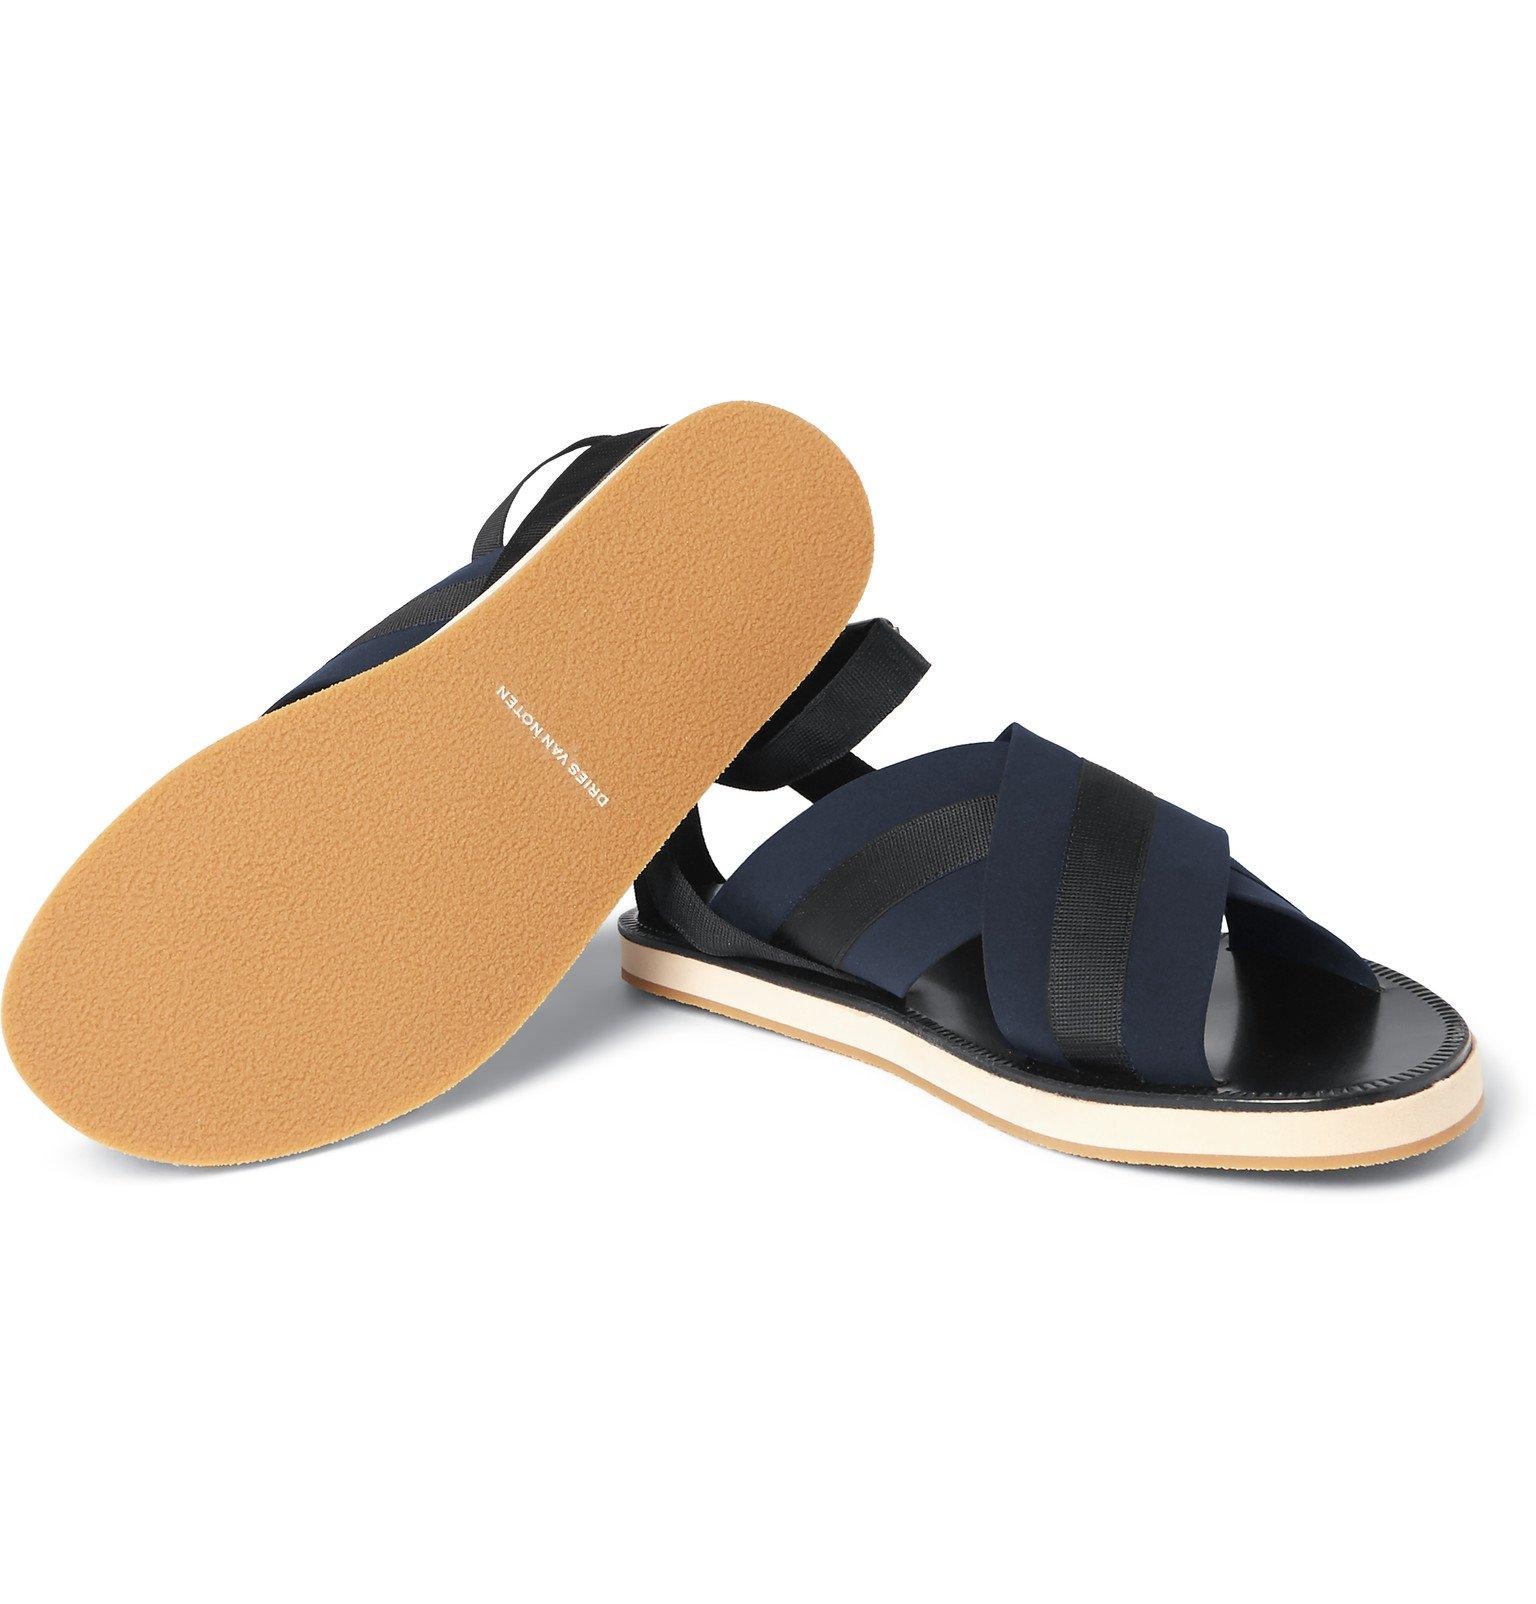 clearance sneakernews eastbay cheap online Dries Van Noten Leather Slide Sandals MrZFh